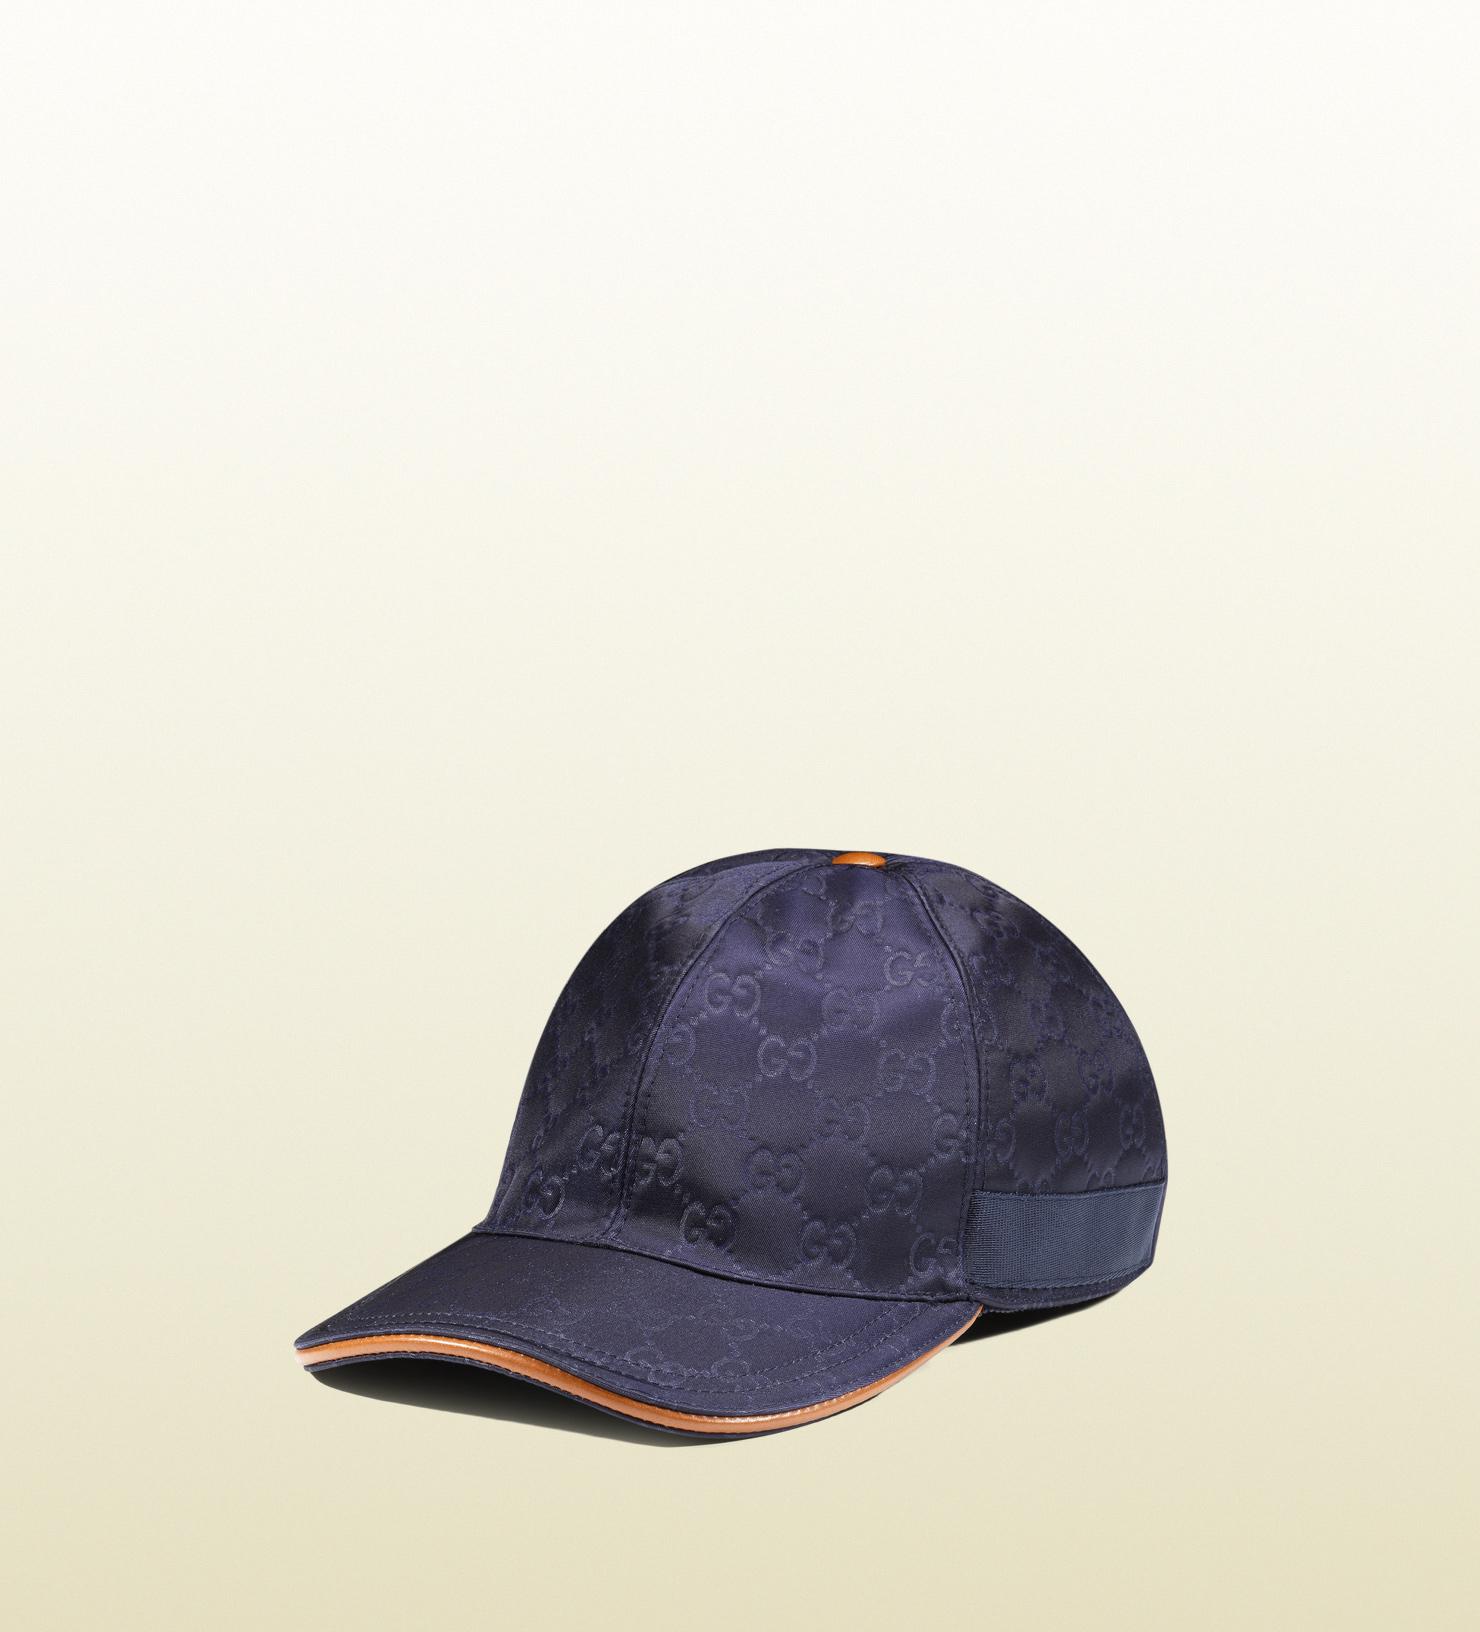 0f350d72 Men's Blue Gg Pattern Baseball Hat with Web Detail